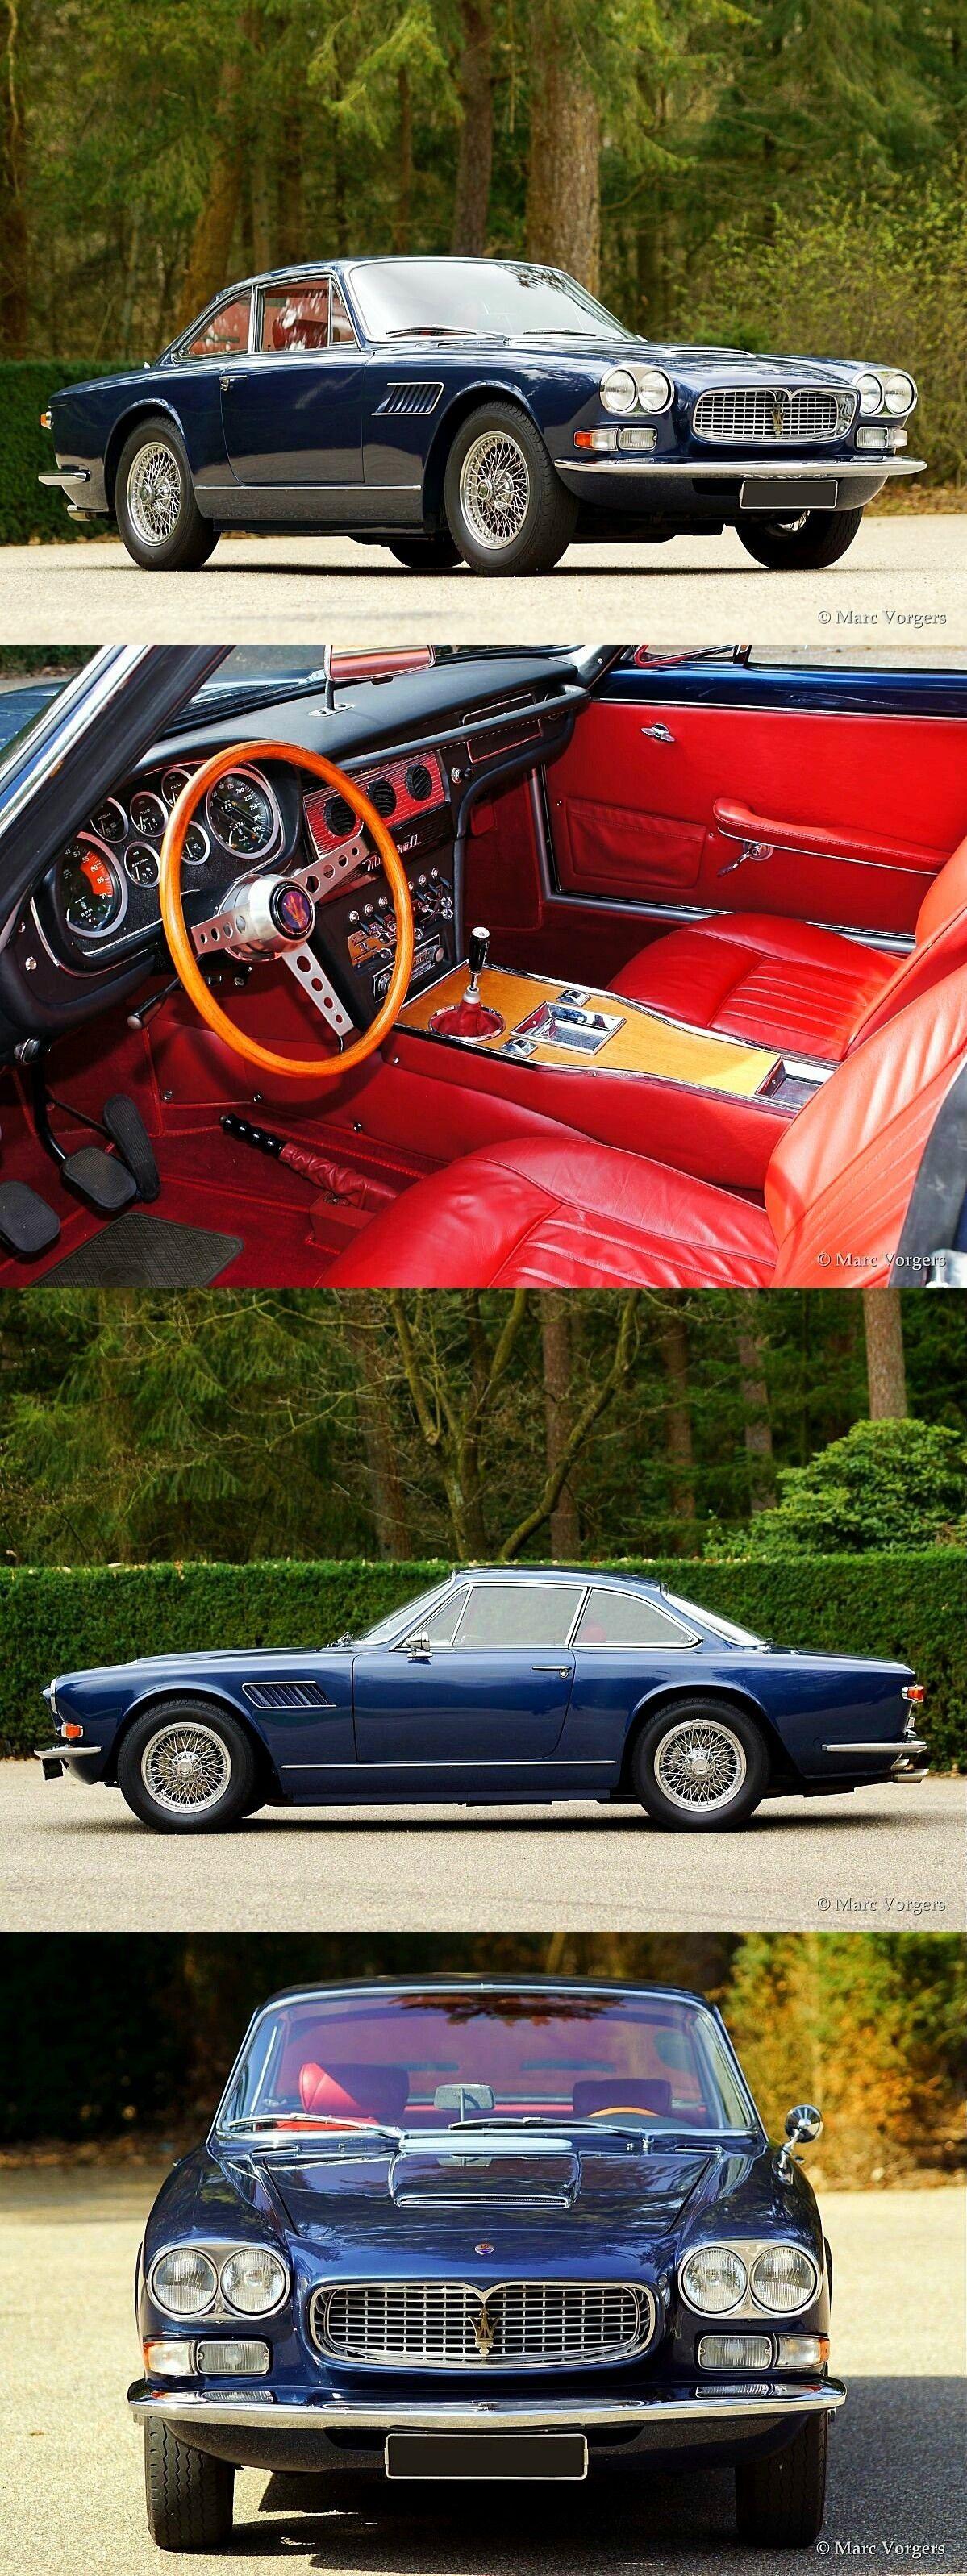 1965 Maserati Sebring - Series 2 | Maserati, Motor car ...